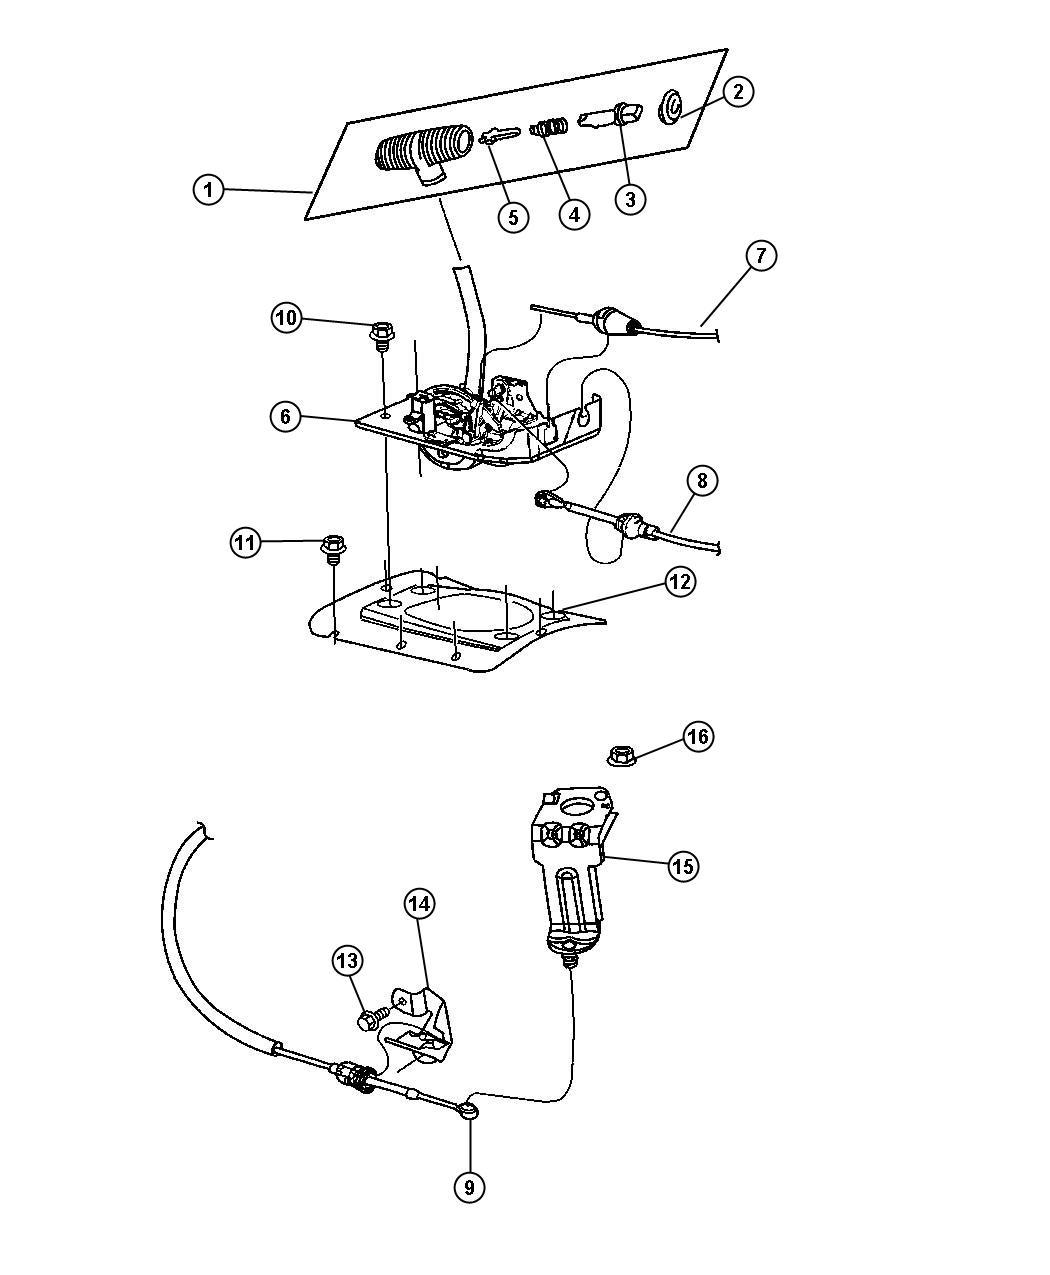 Jeep Wrangler Housing Shift Lever Controlsskid